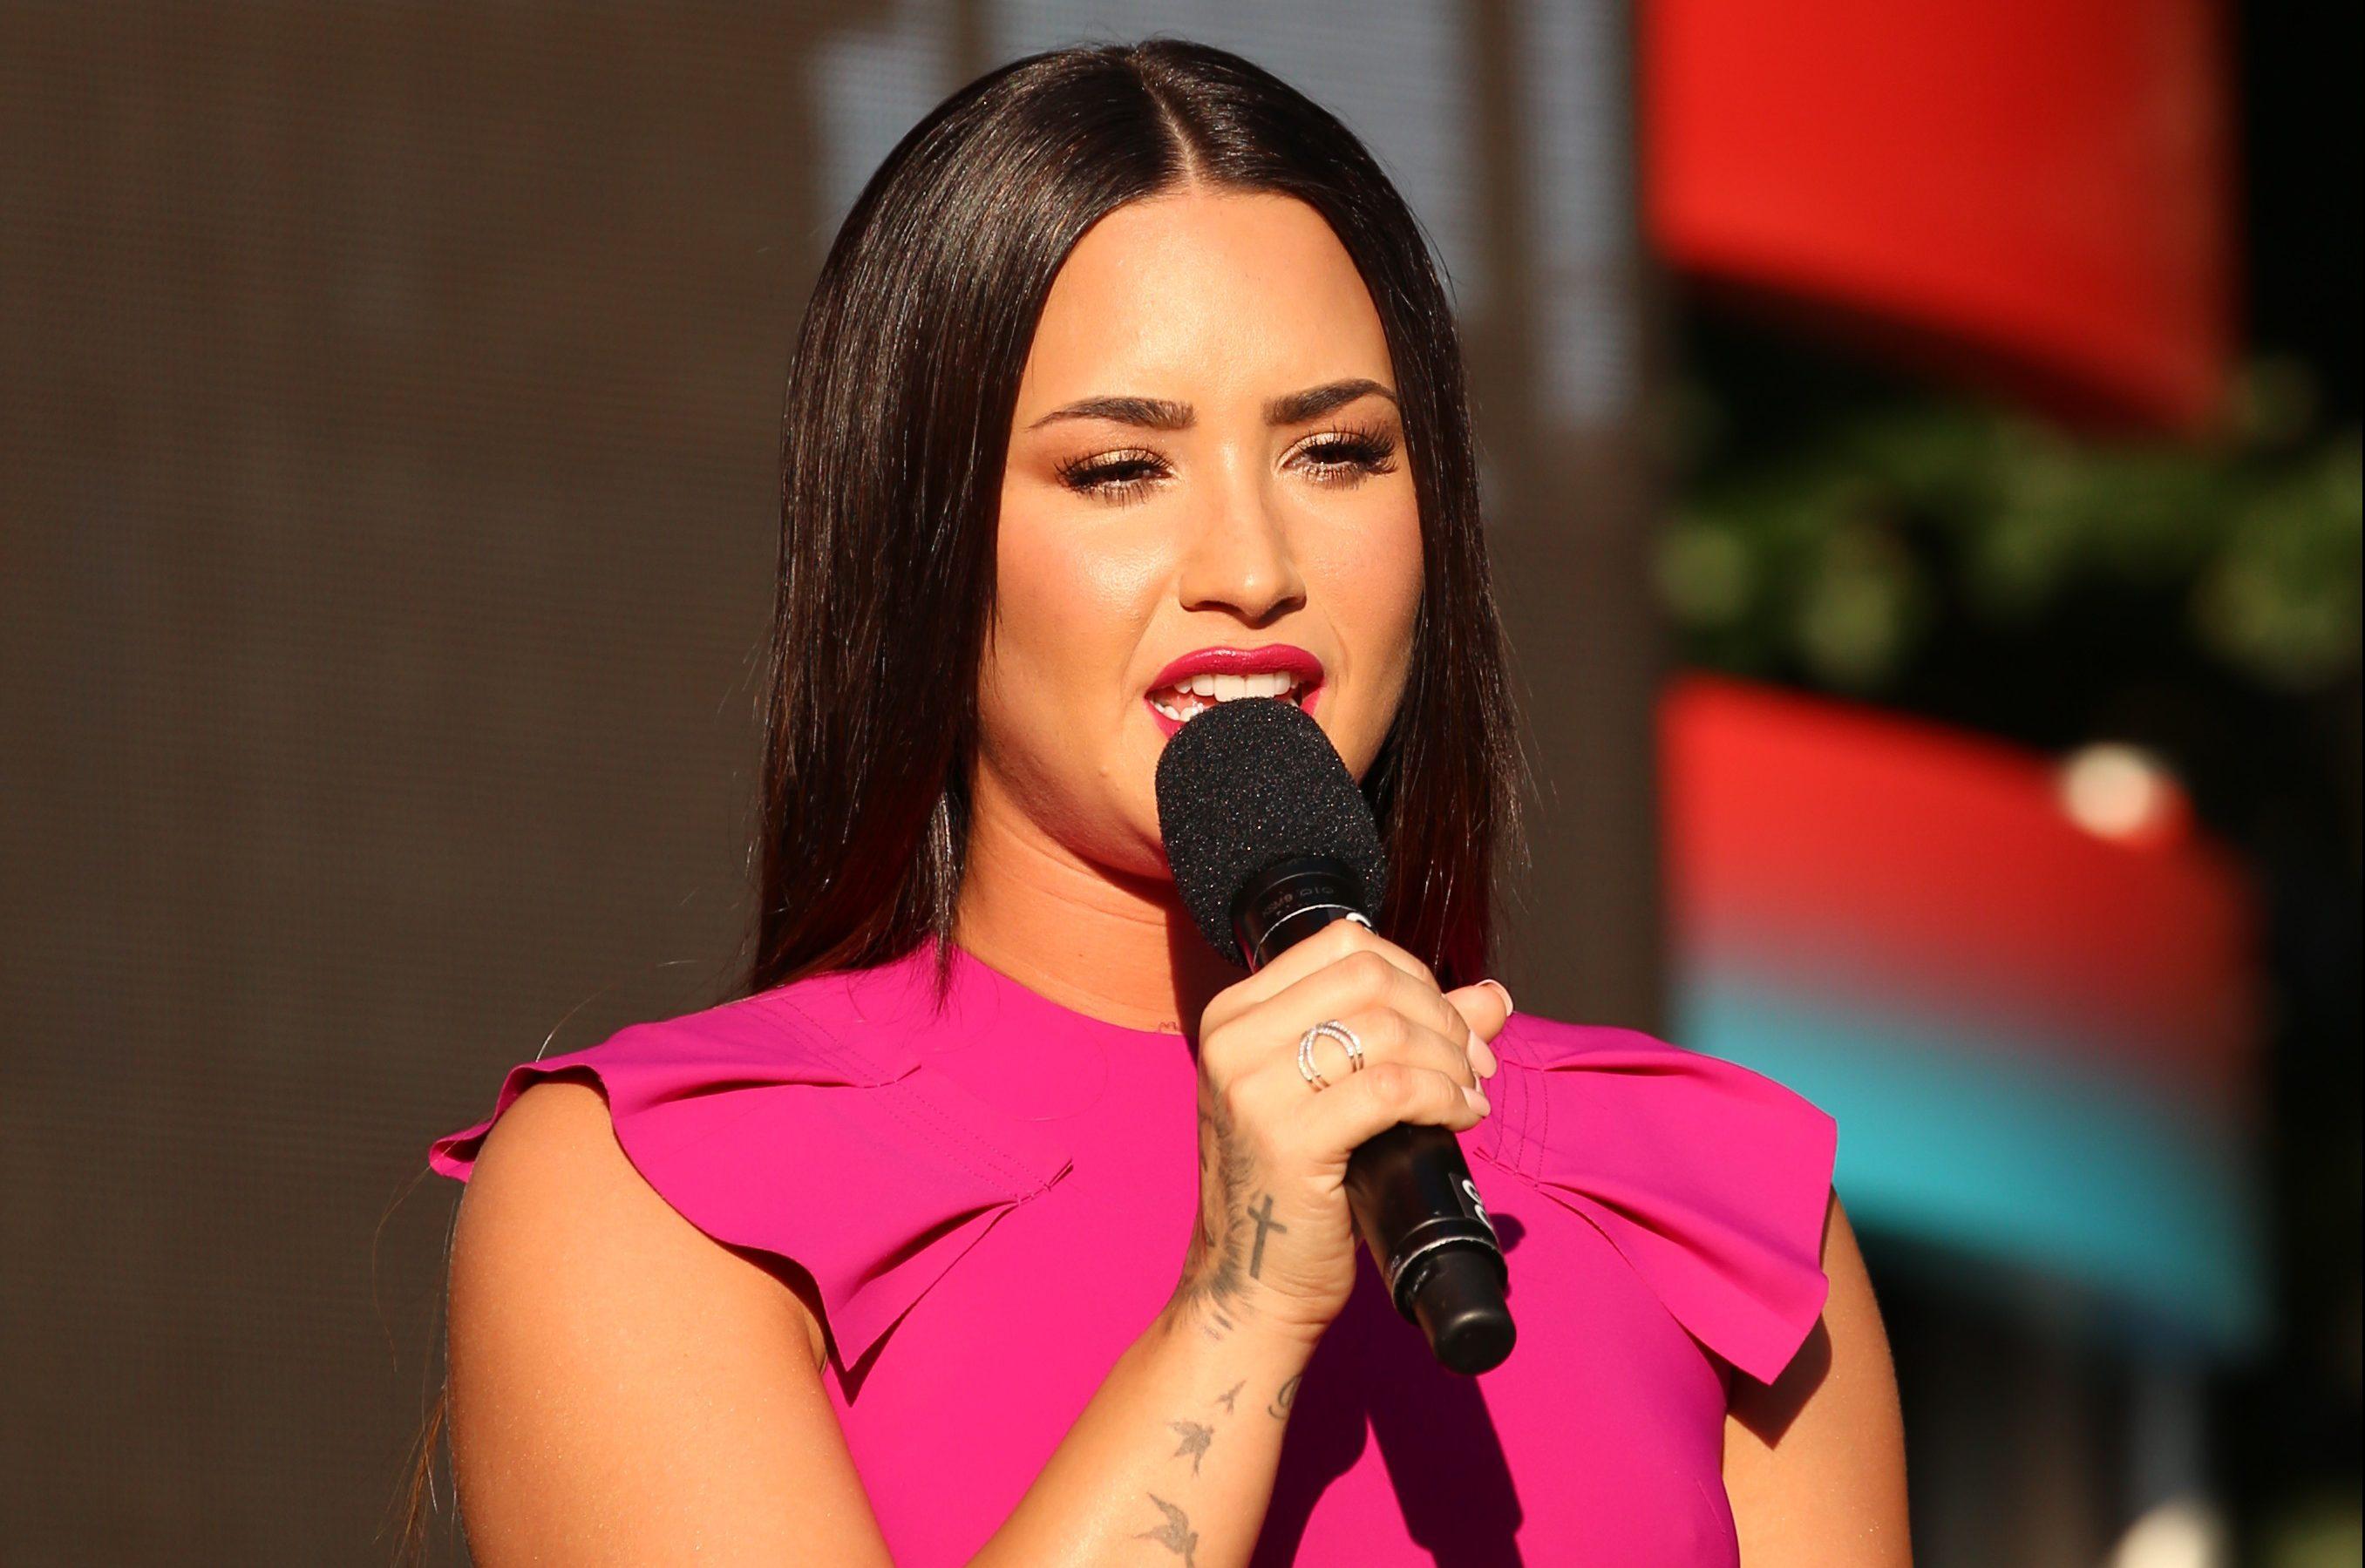 Demi Lovato at 2017 Global Citizen Festival